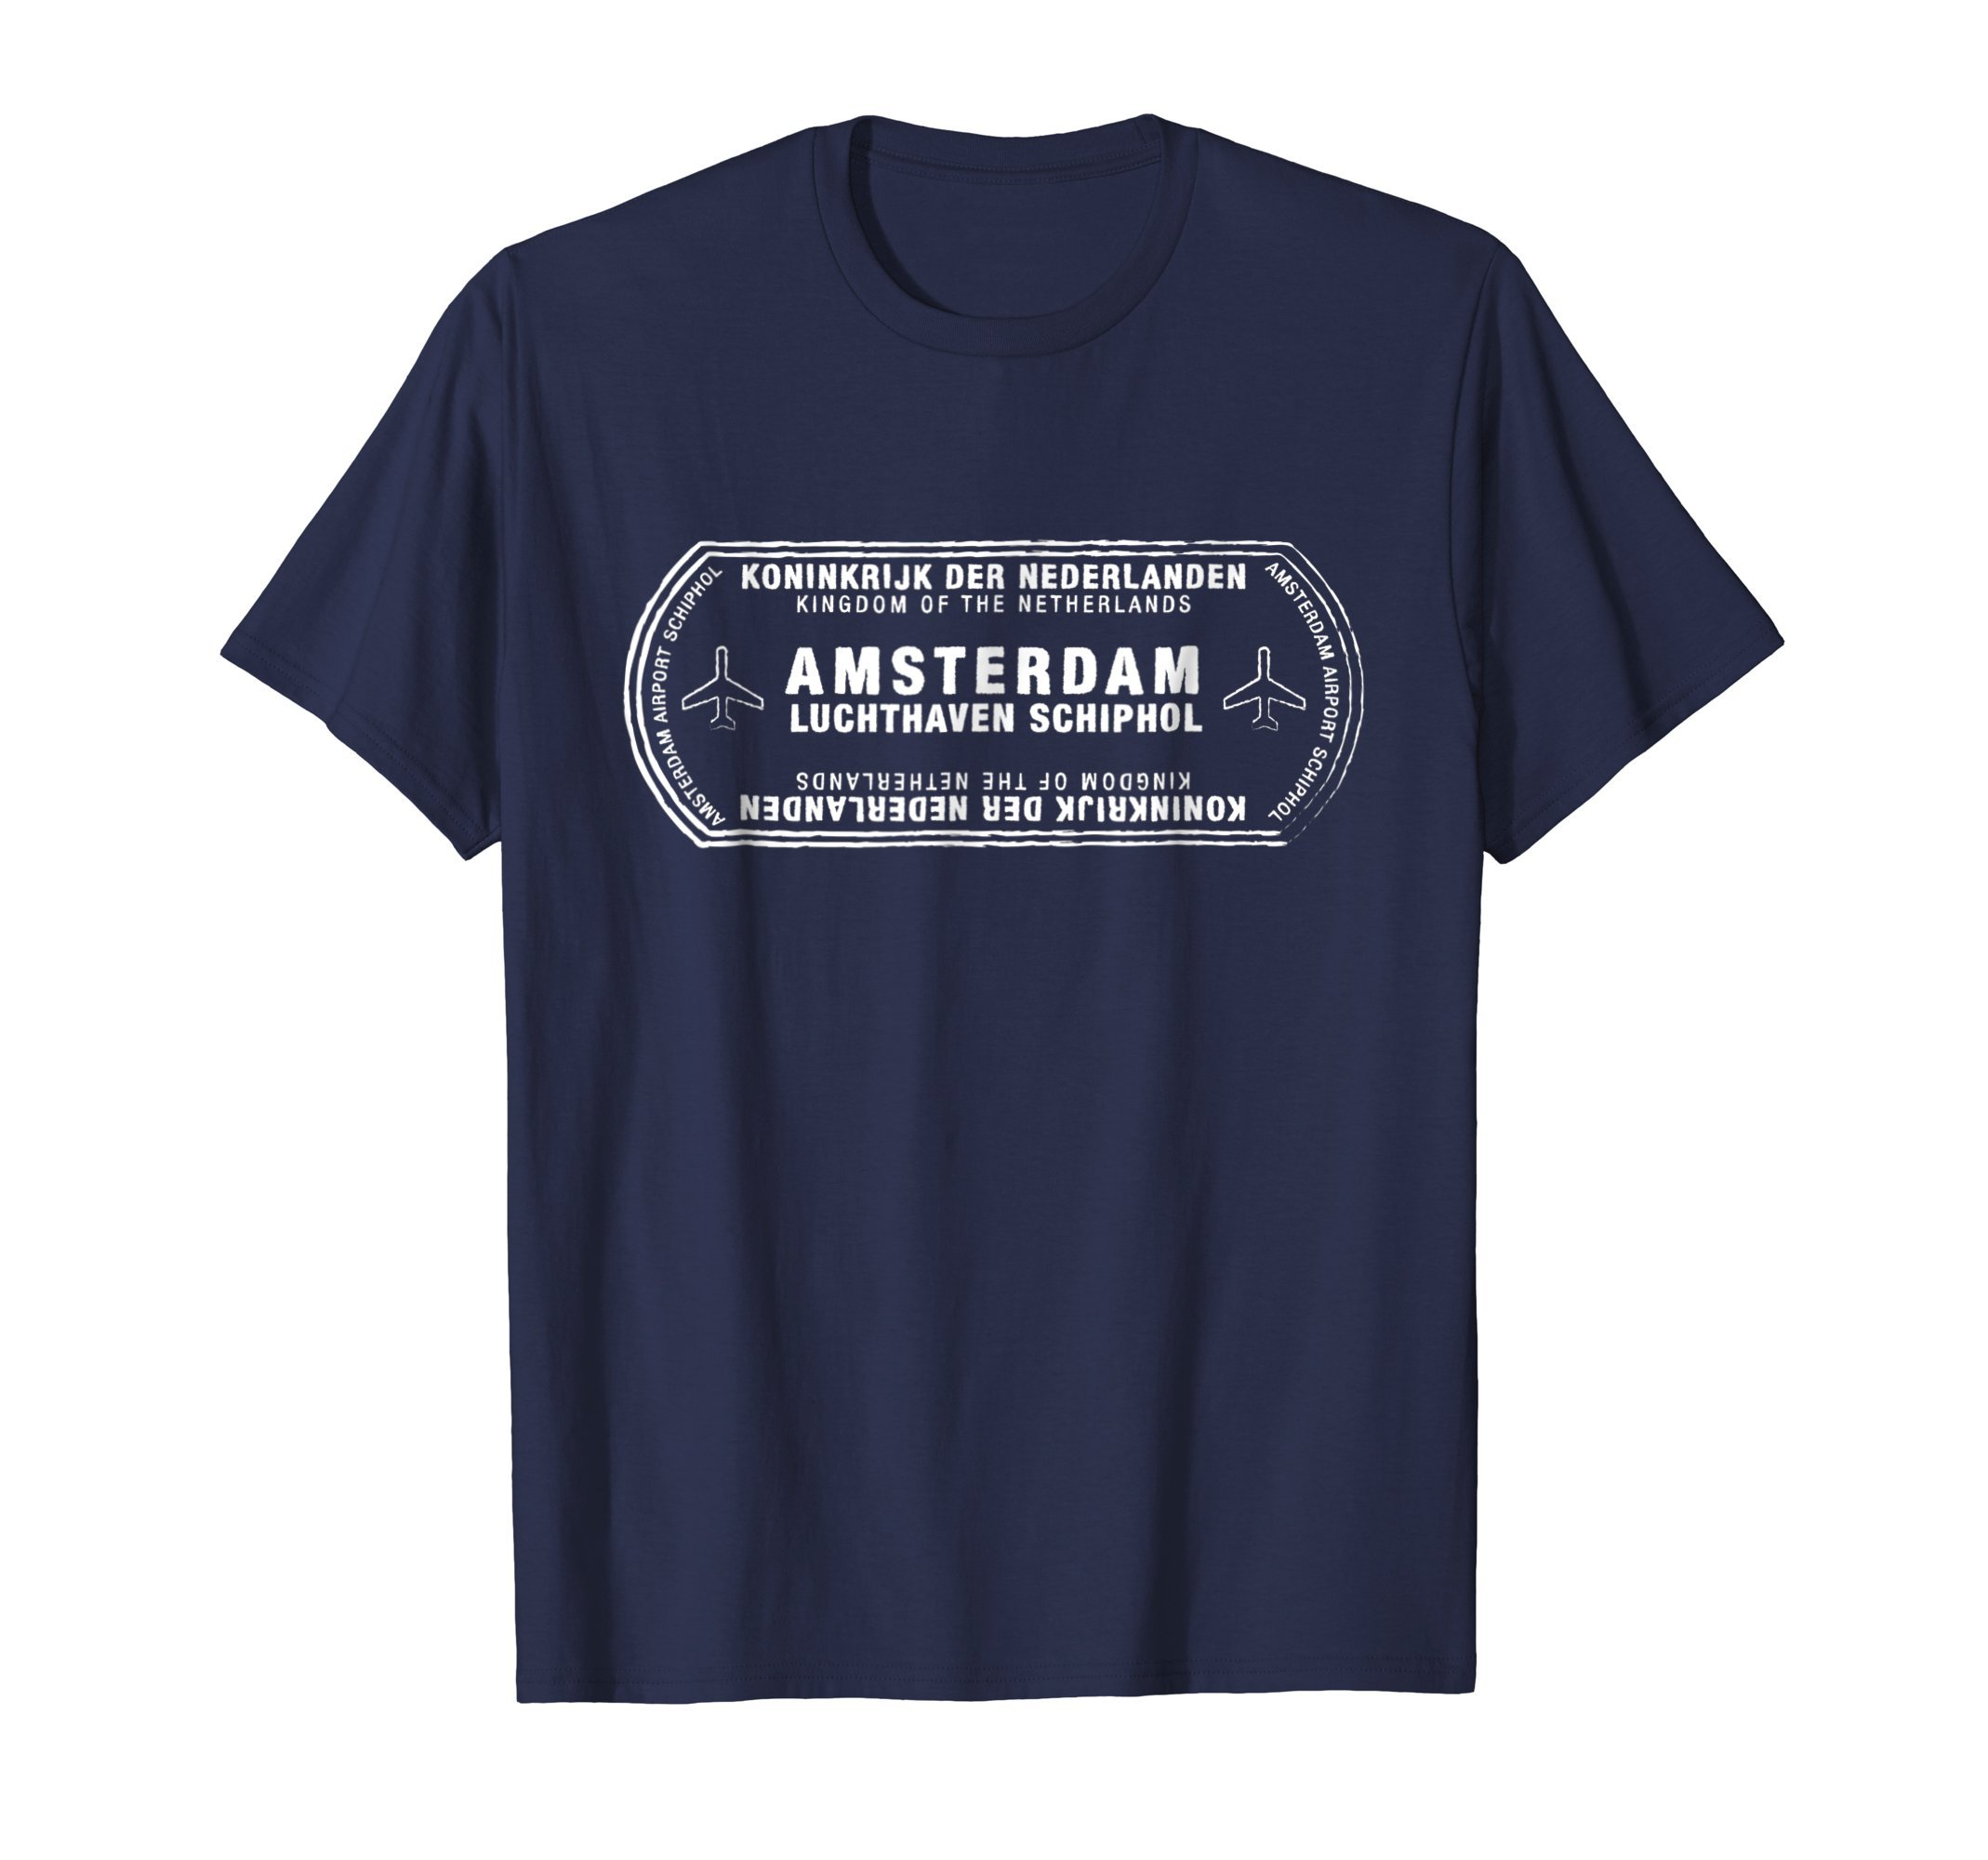 Amsterdam Netherlands Passport Stamp Vacation Travel T-Shirt